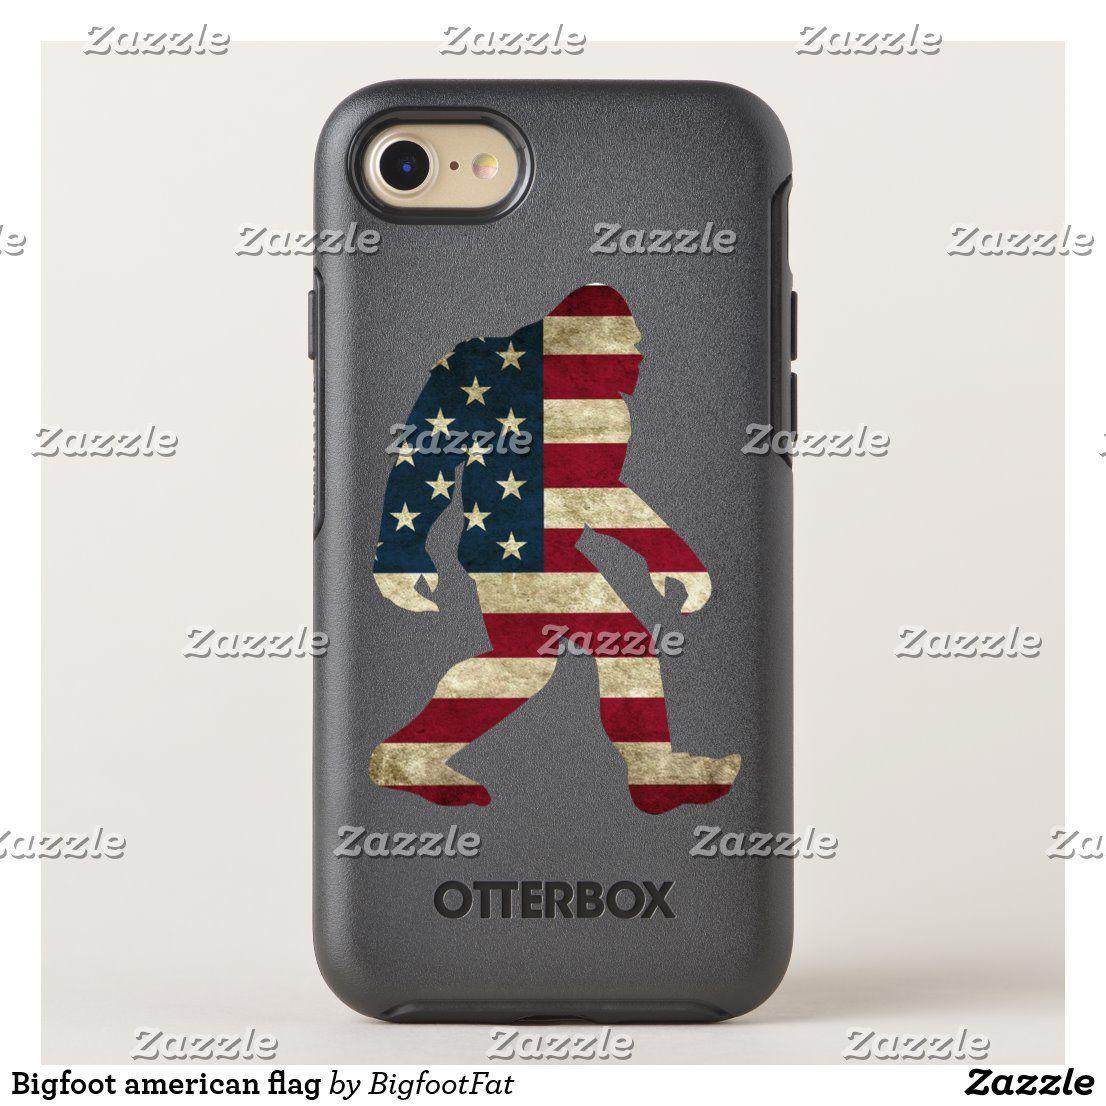 Bigfoot american flag OtterBox iPhone case | Zazzle.com – Phone Cases